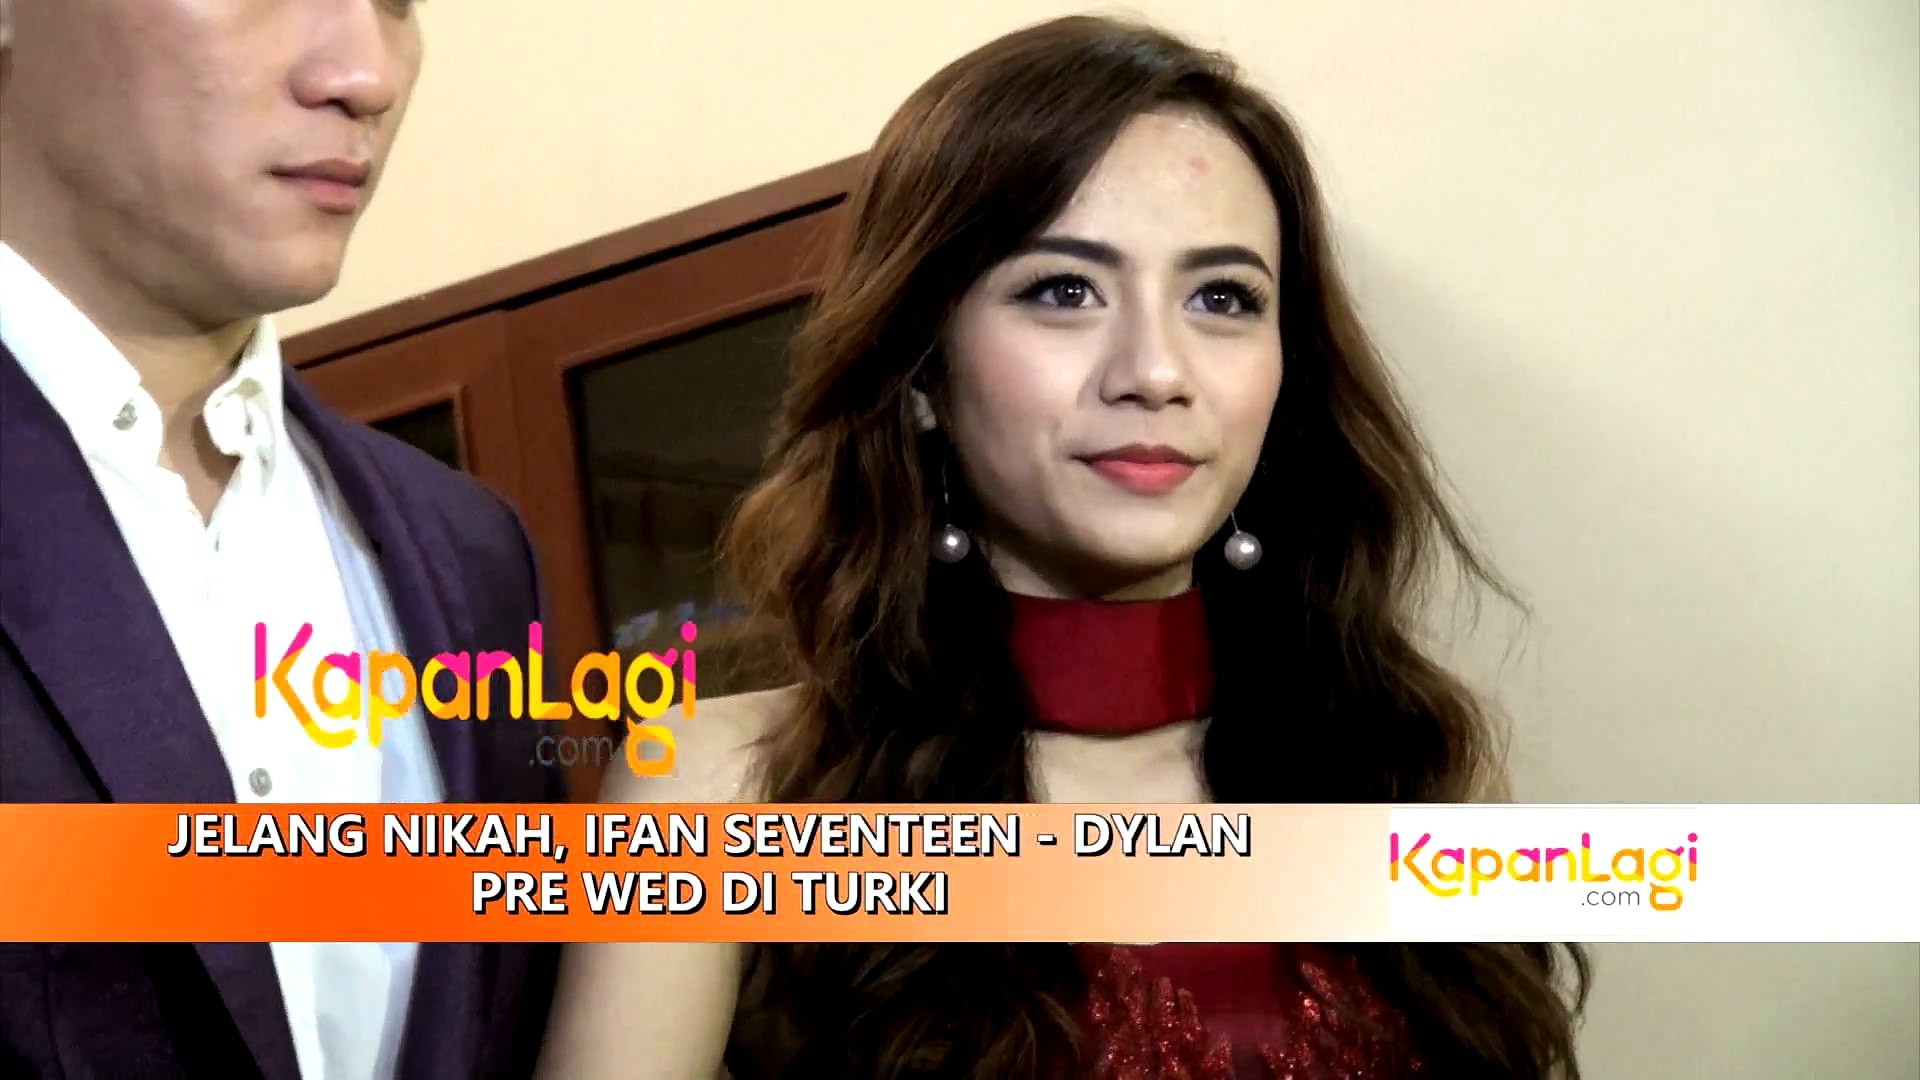 Jelang Nikah, Ifan Seventeen-Dylan Foto Pre Wedd di Turki